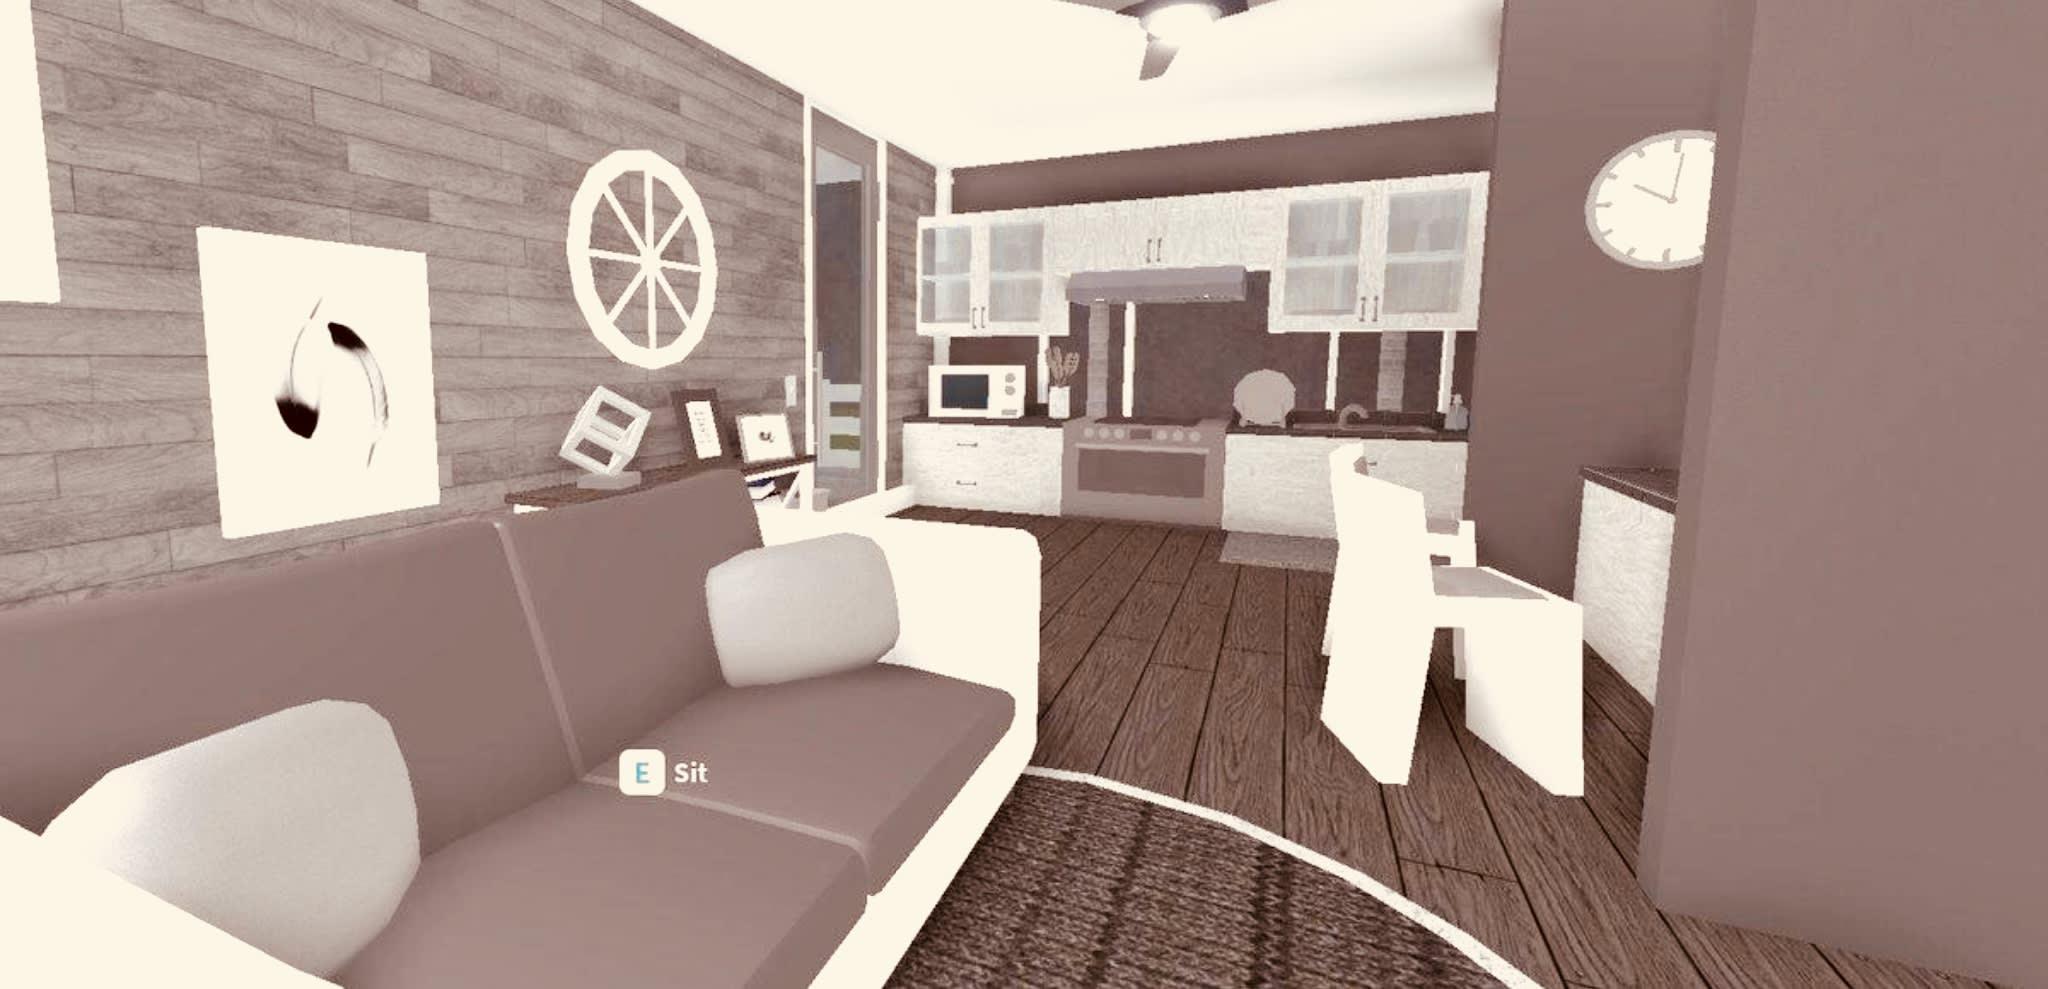 Give You A Custom Offer For A Bloxburg House By Rosieunicornss